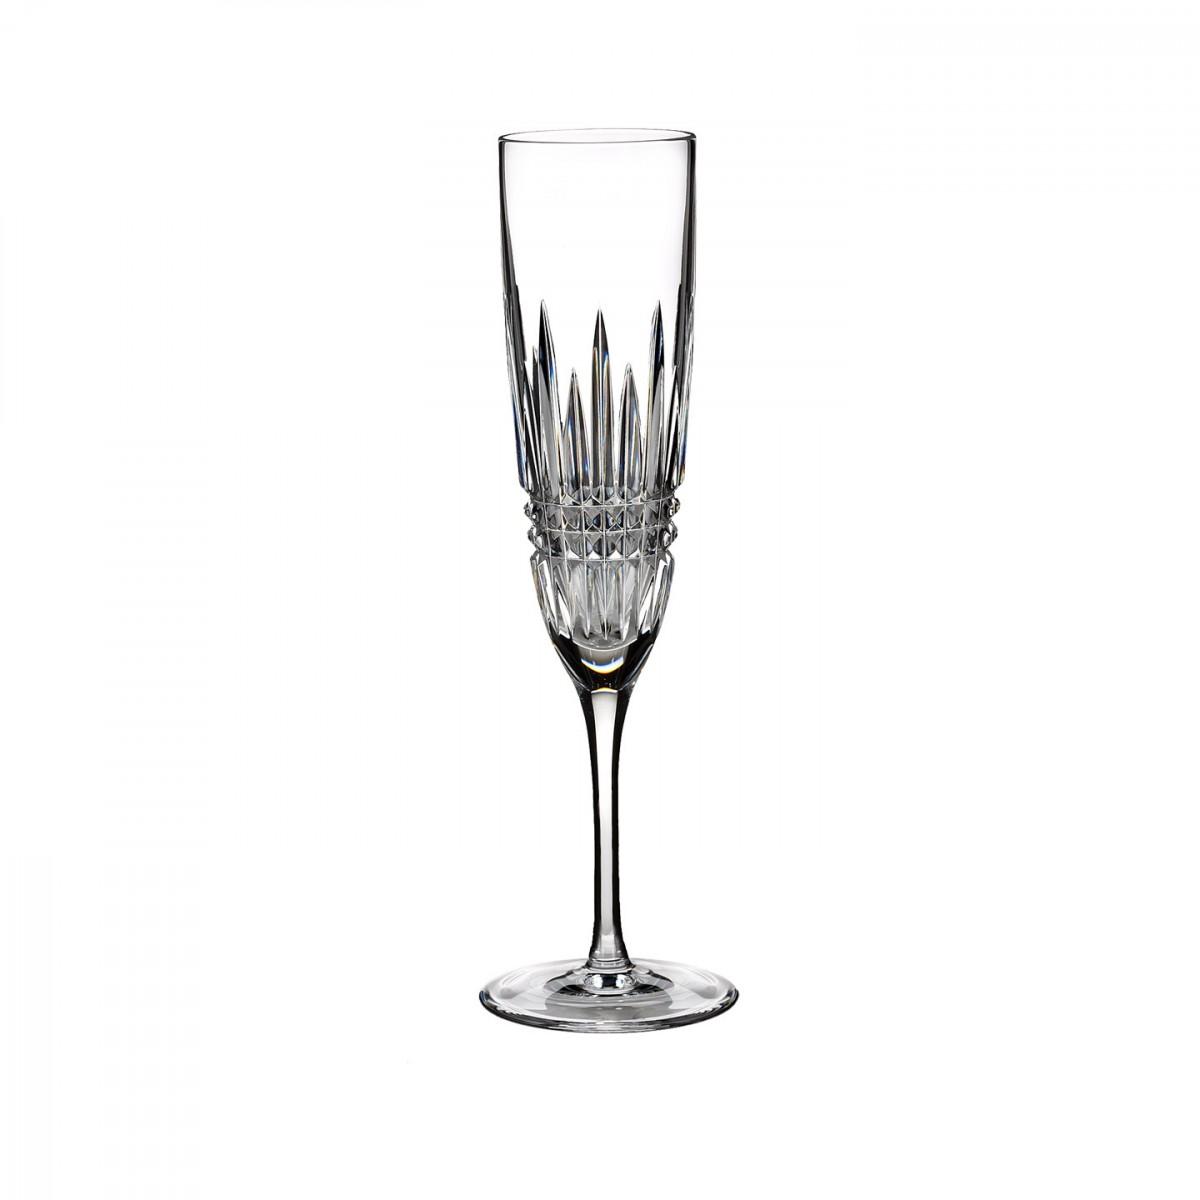 Waterford Crystal, Lismore Diamond Crystal Flute, Single